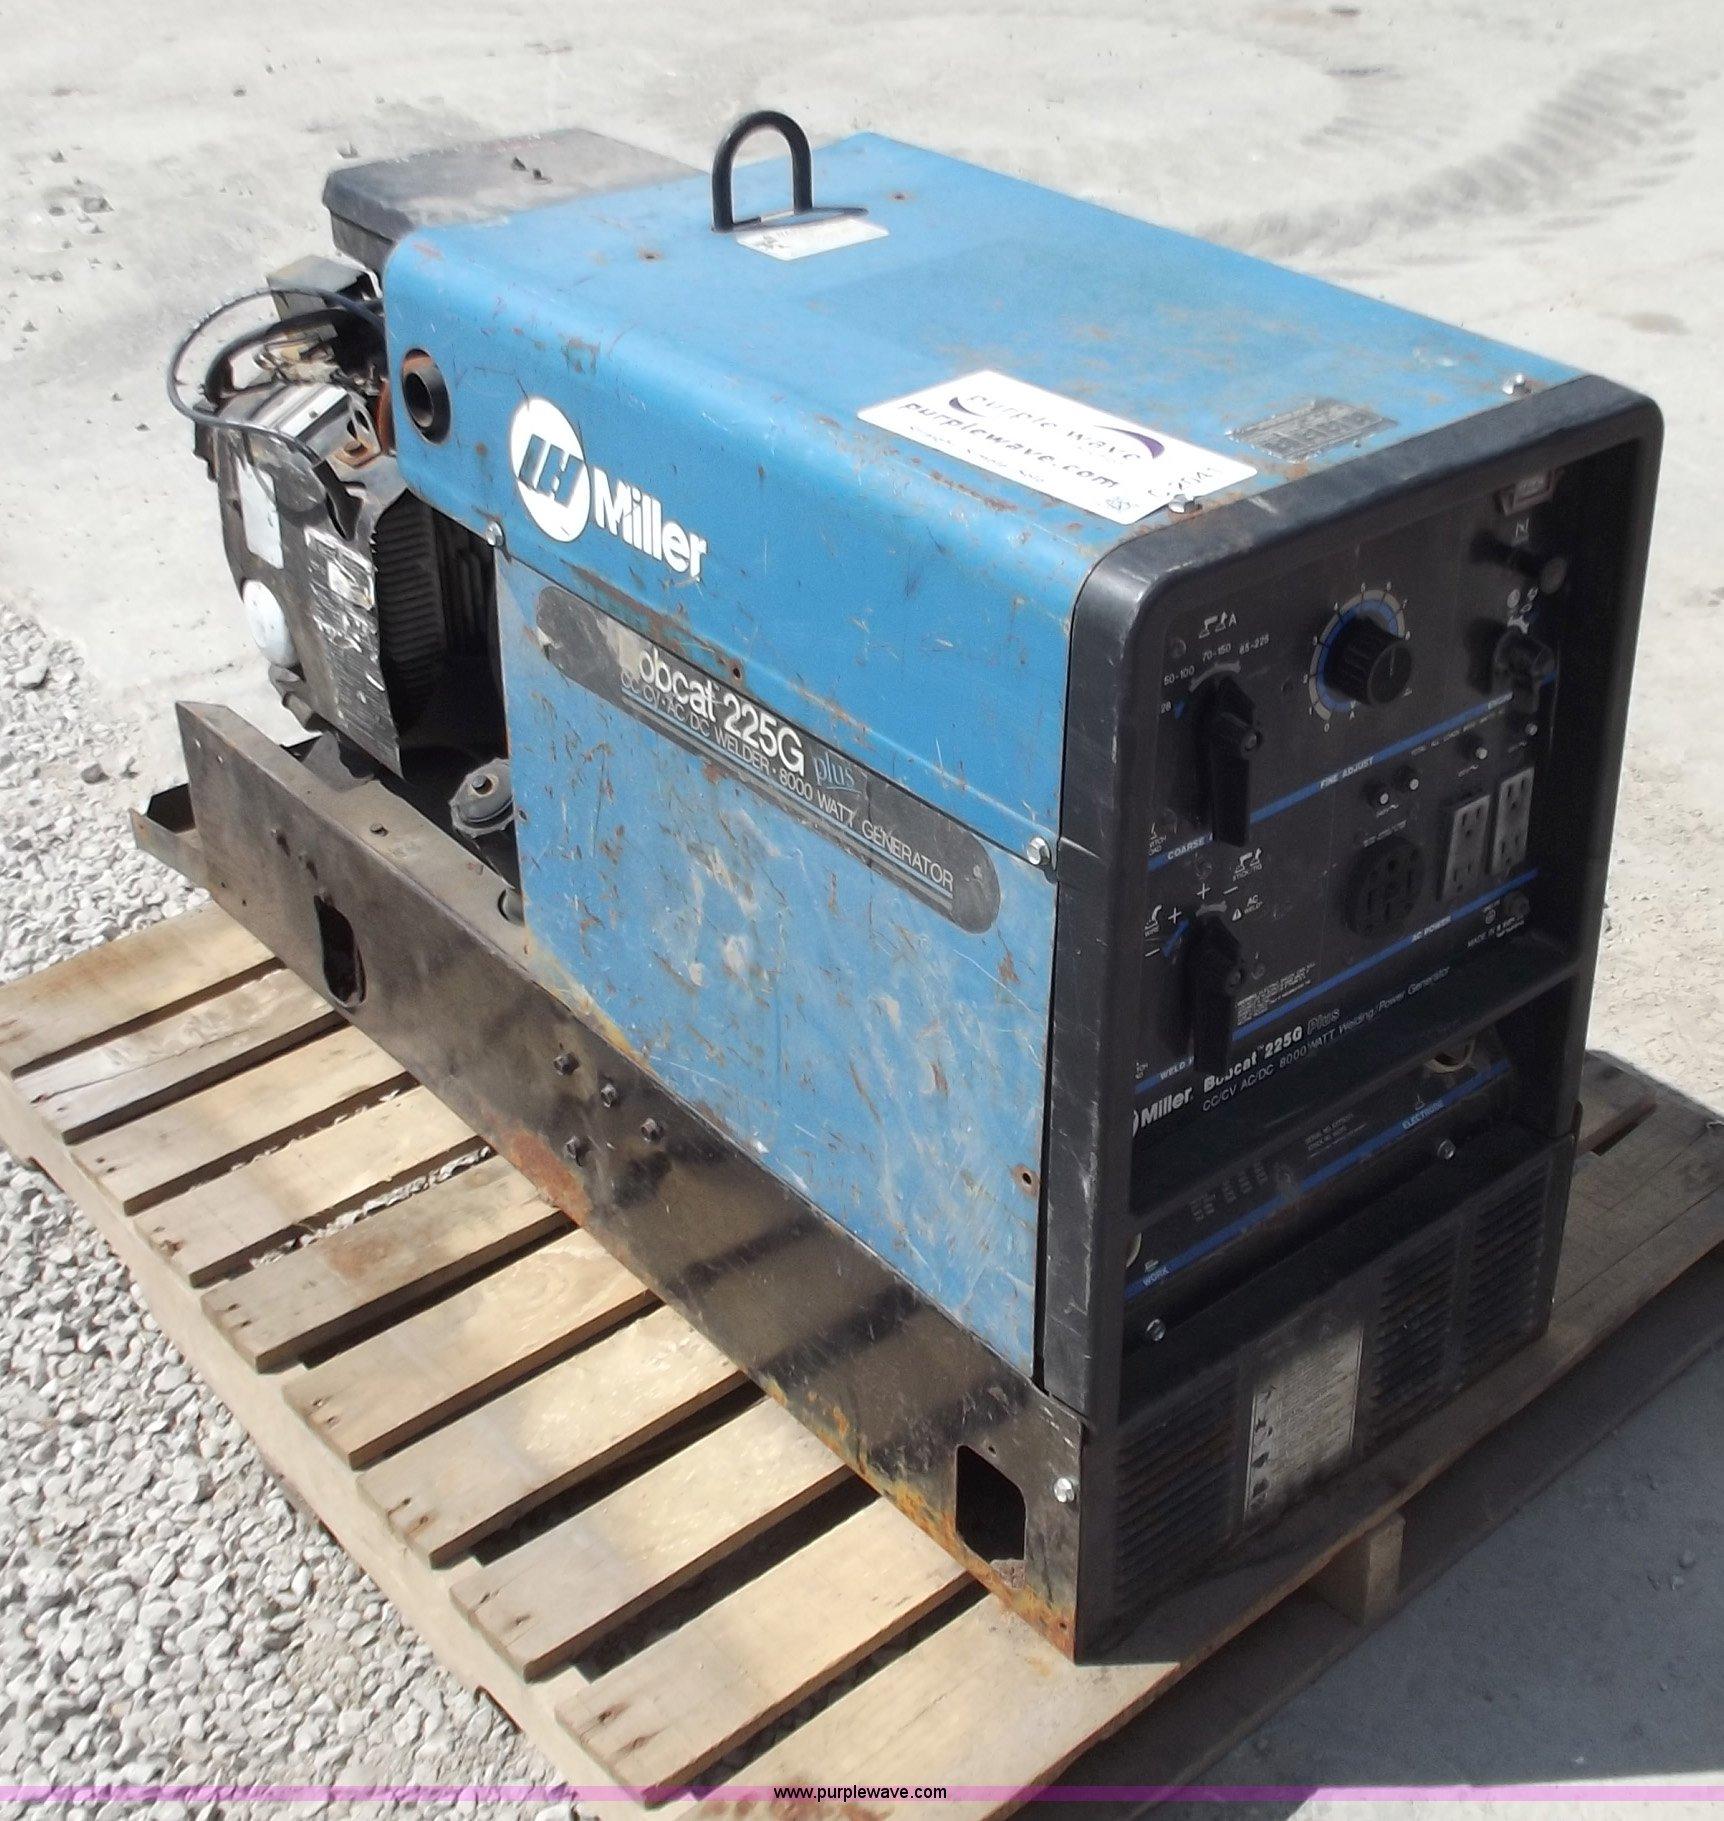 Miller Bobcat 225g Plus Welder Generator Item C2041